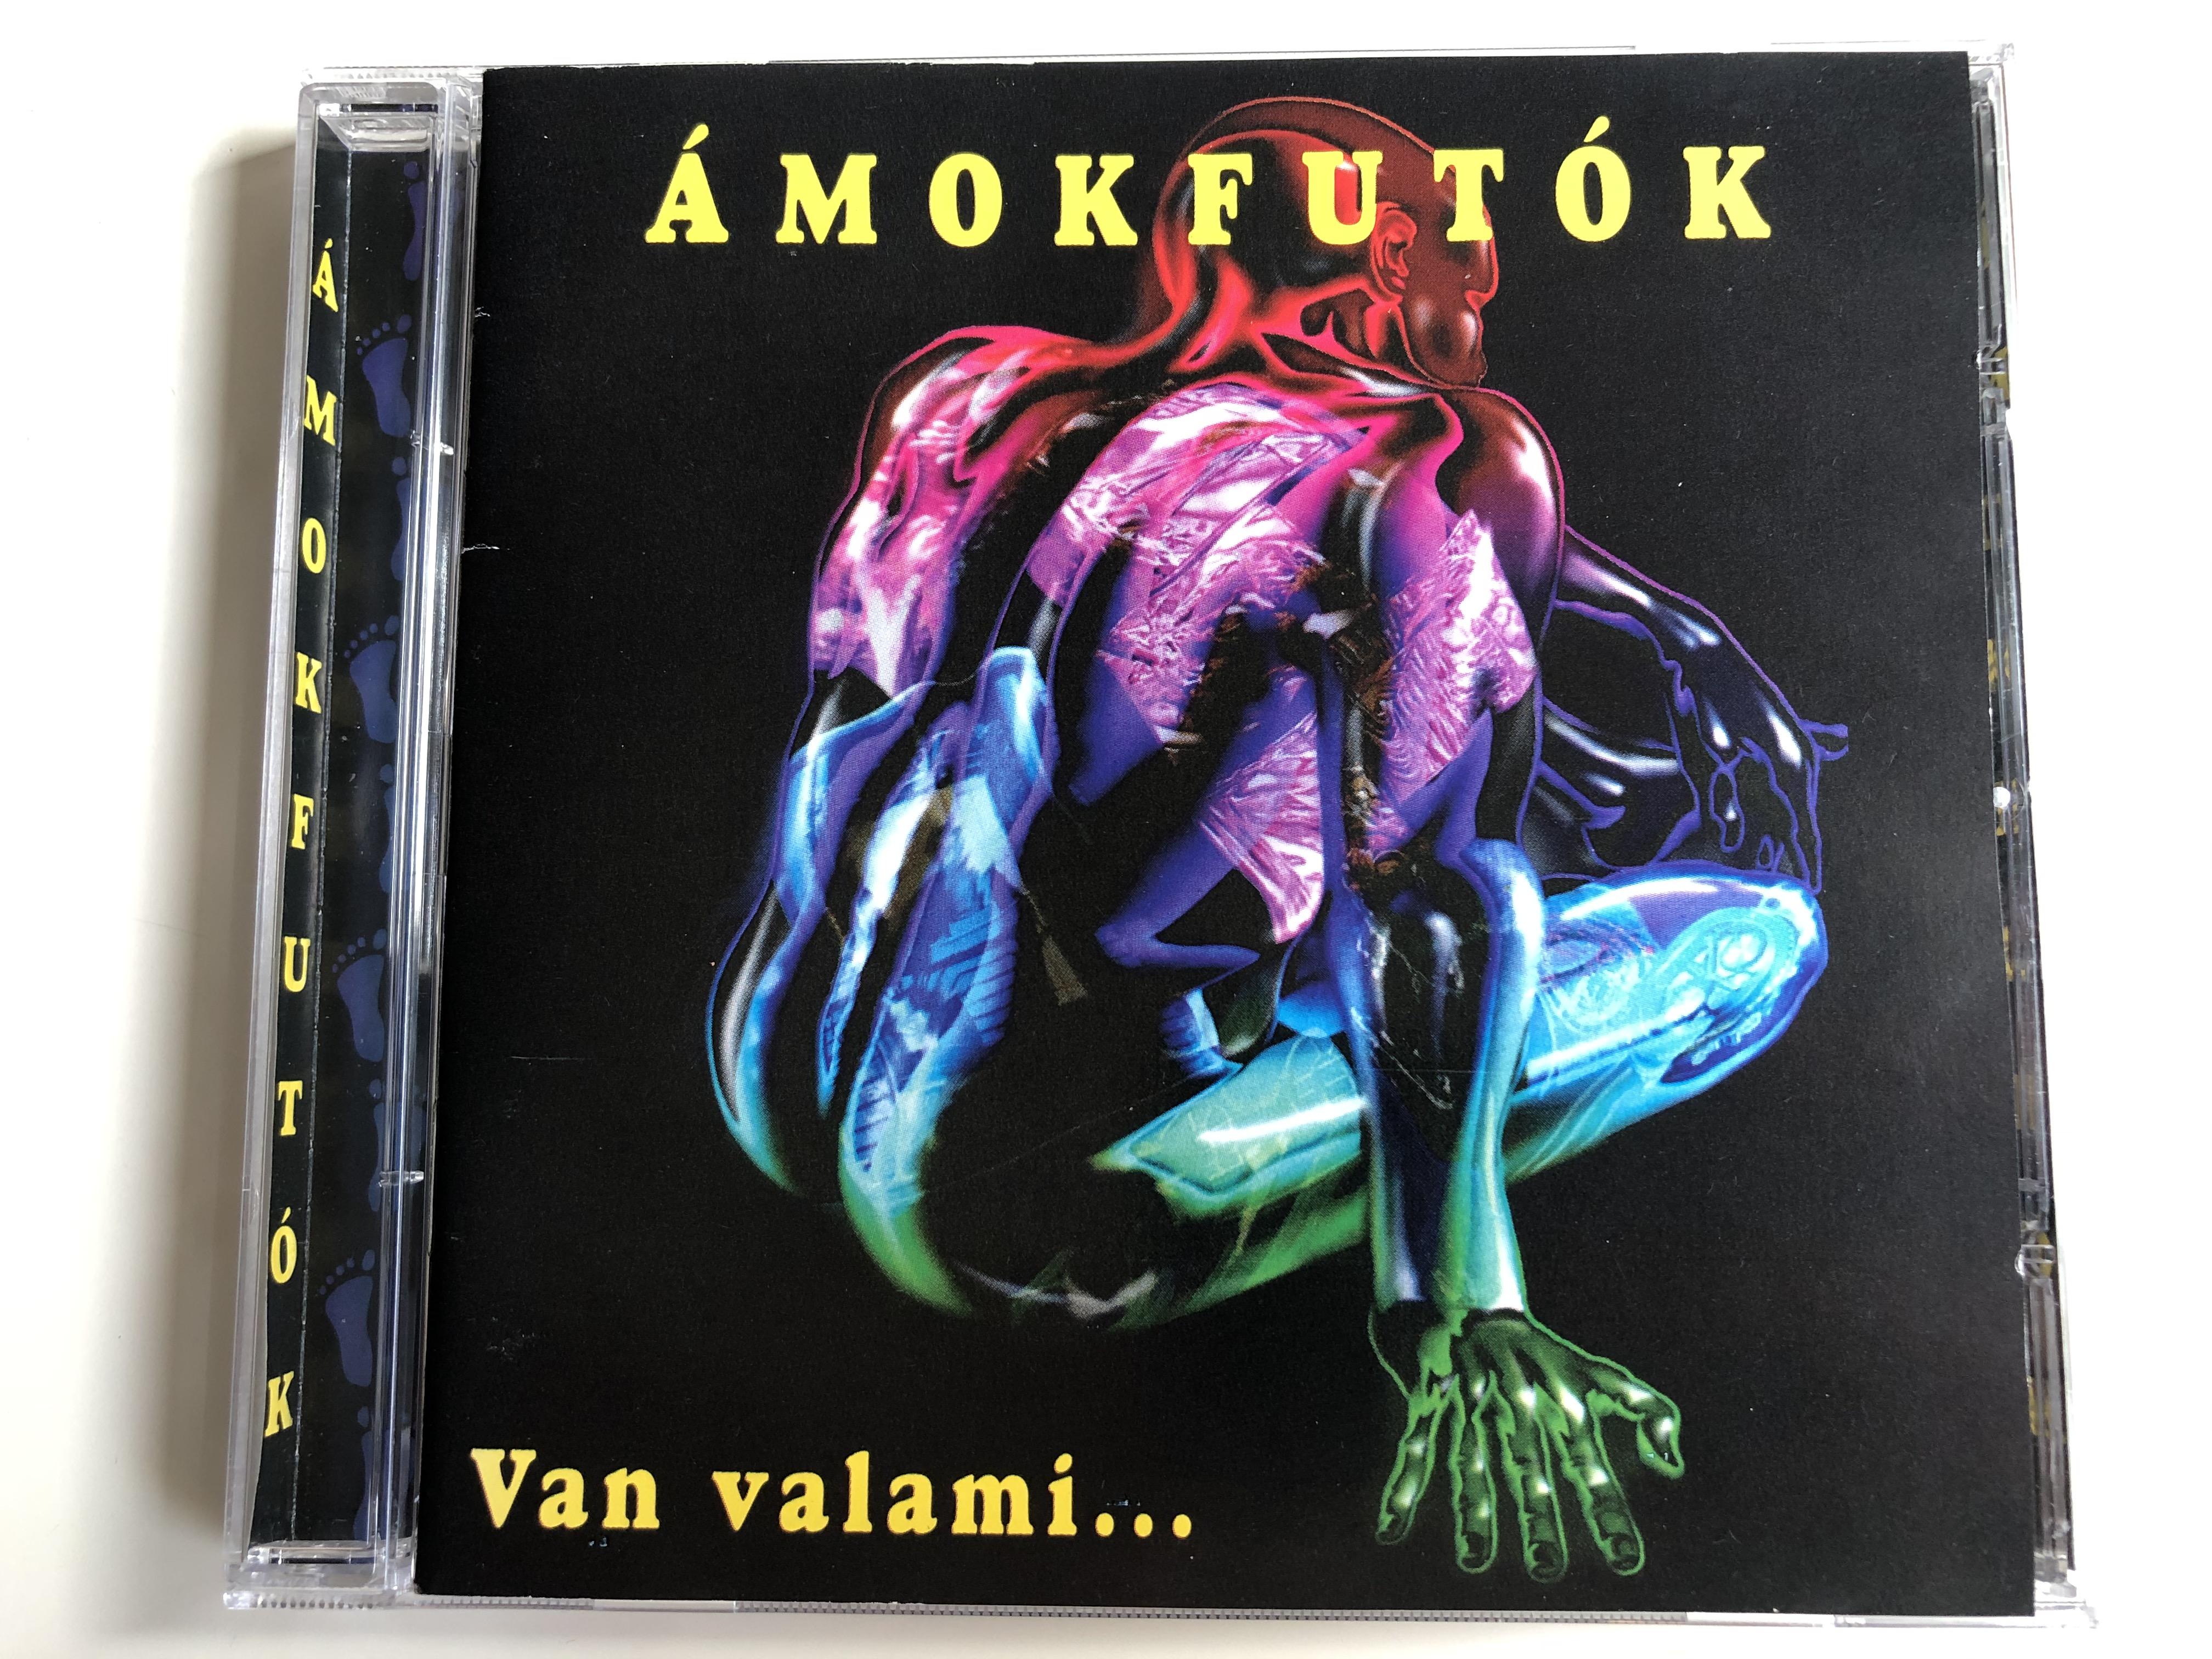 -mokfut-k-van-valami...-magneoton-audio-cd-1997-3984-21270-2-1-.jpg